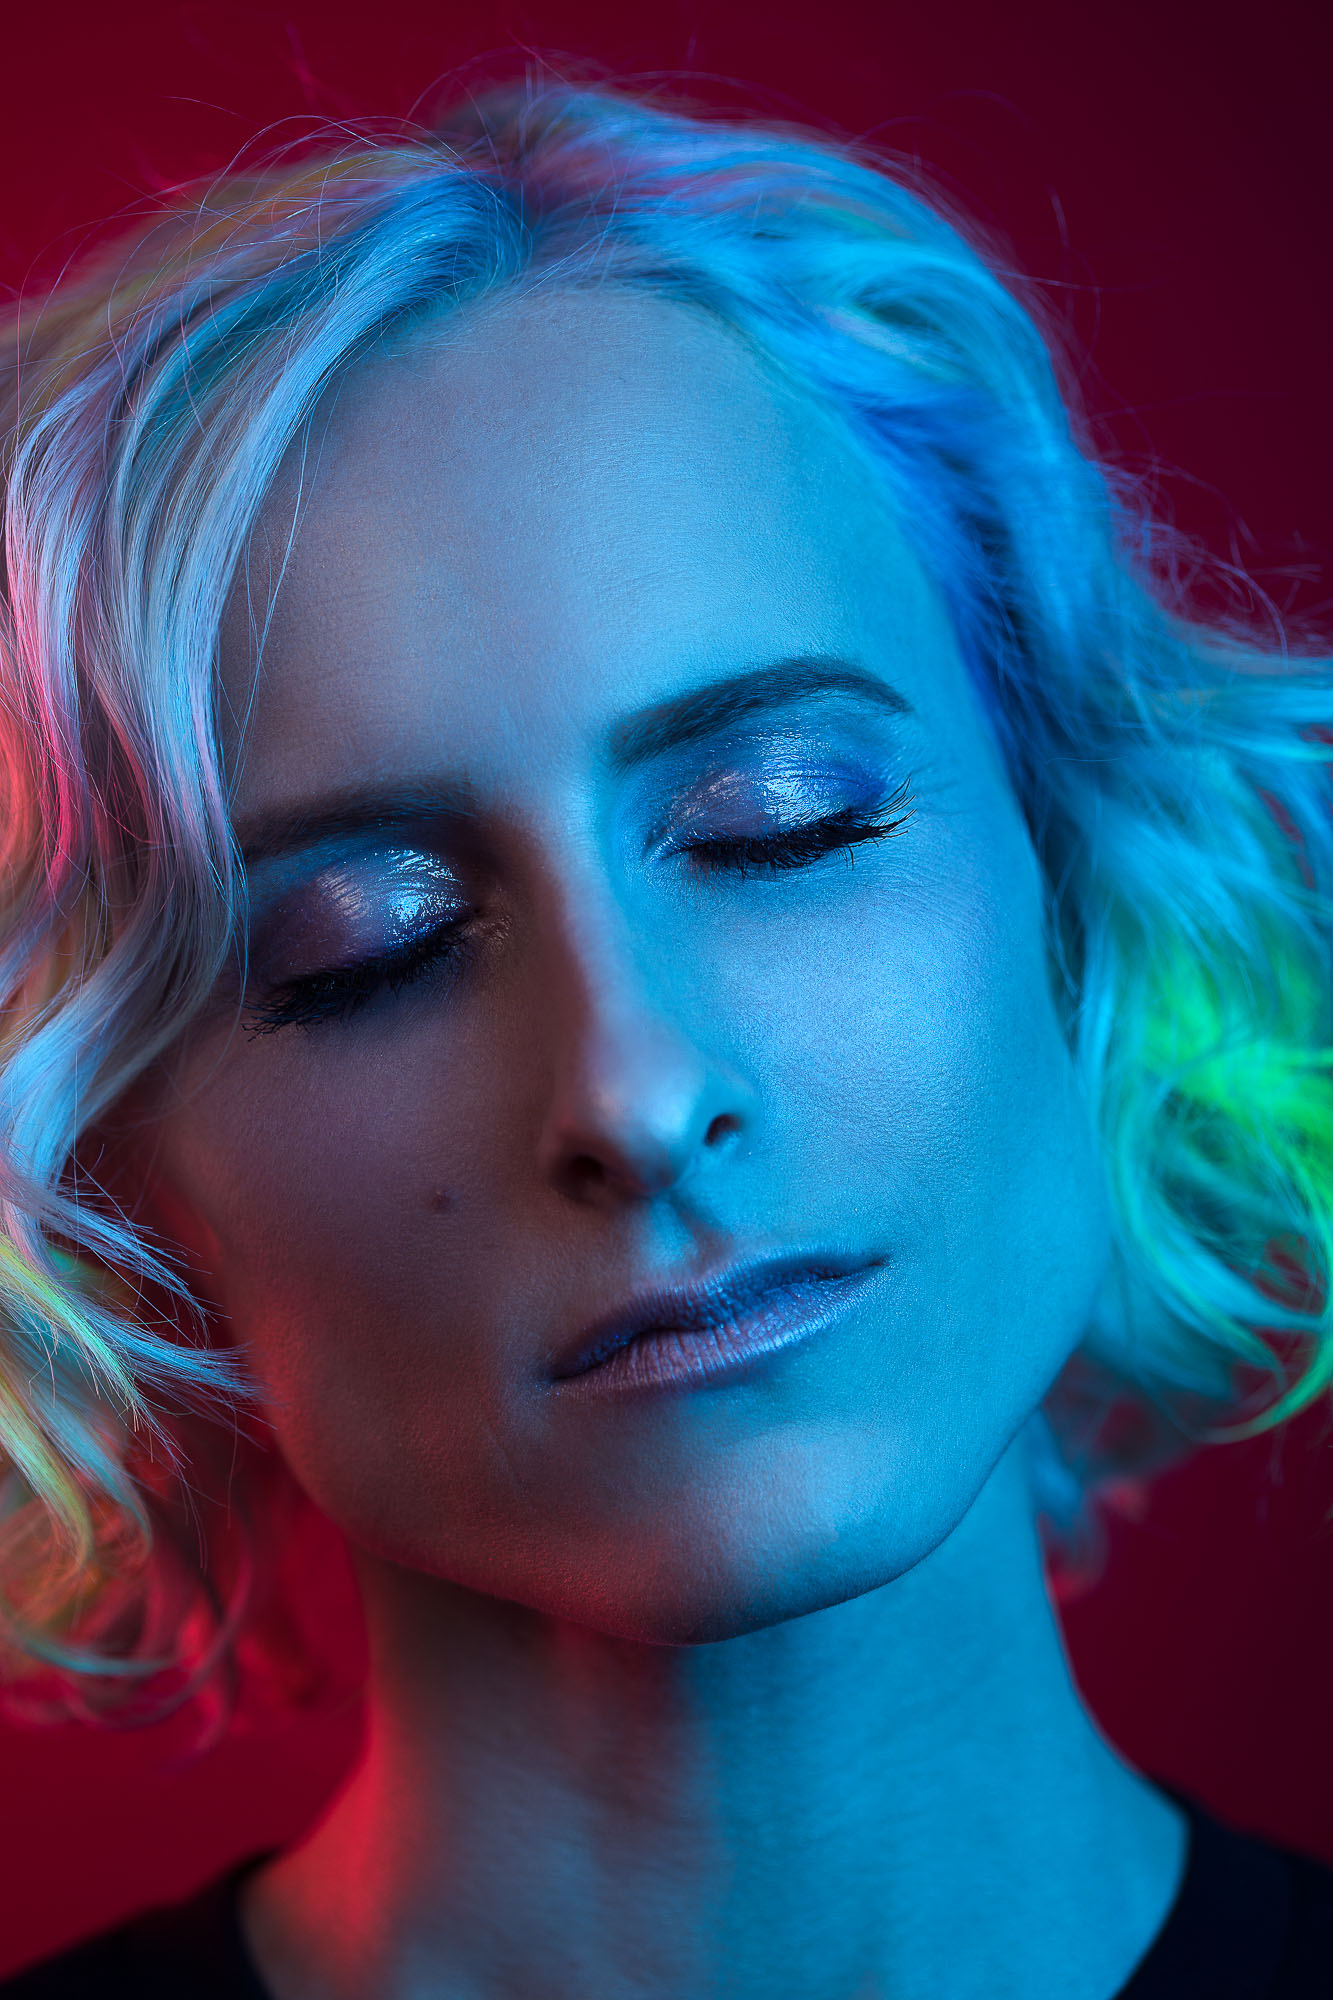 Makeup Artist Marissa Freeman